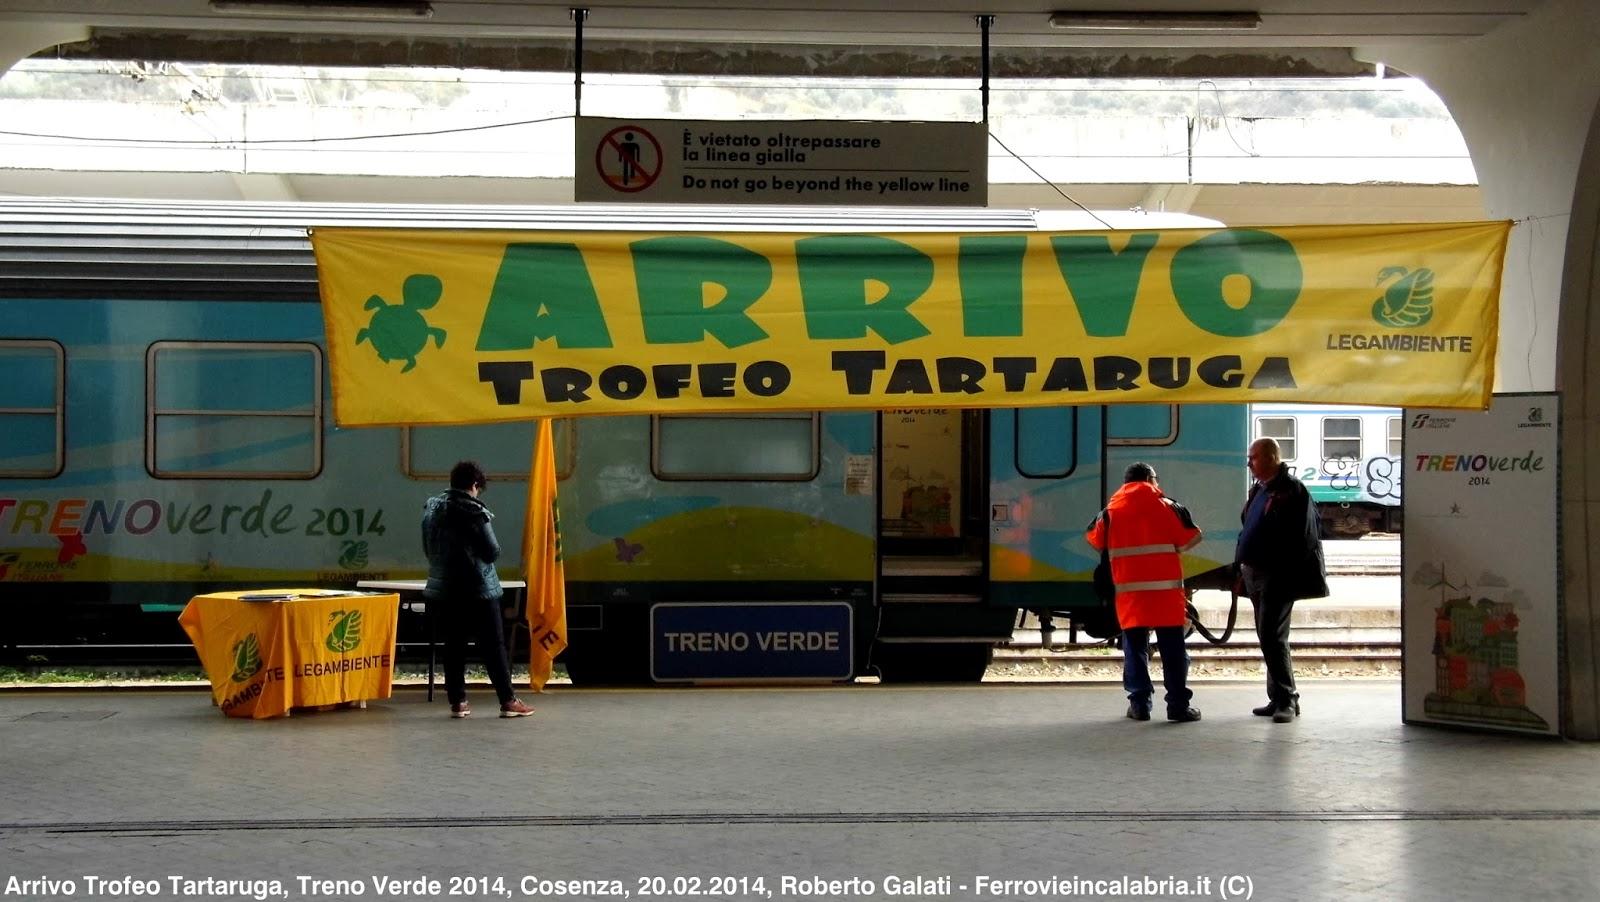 TrenoVerde2014-Cosenza-2014-02-20-RobertoGalati